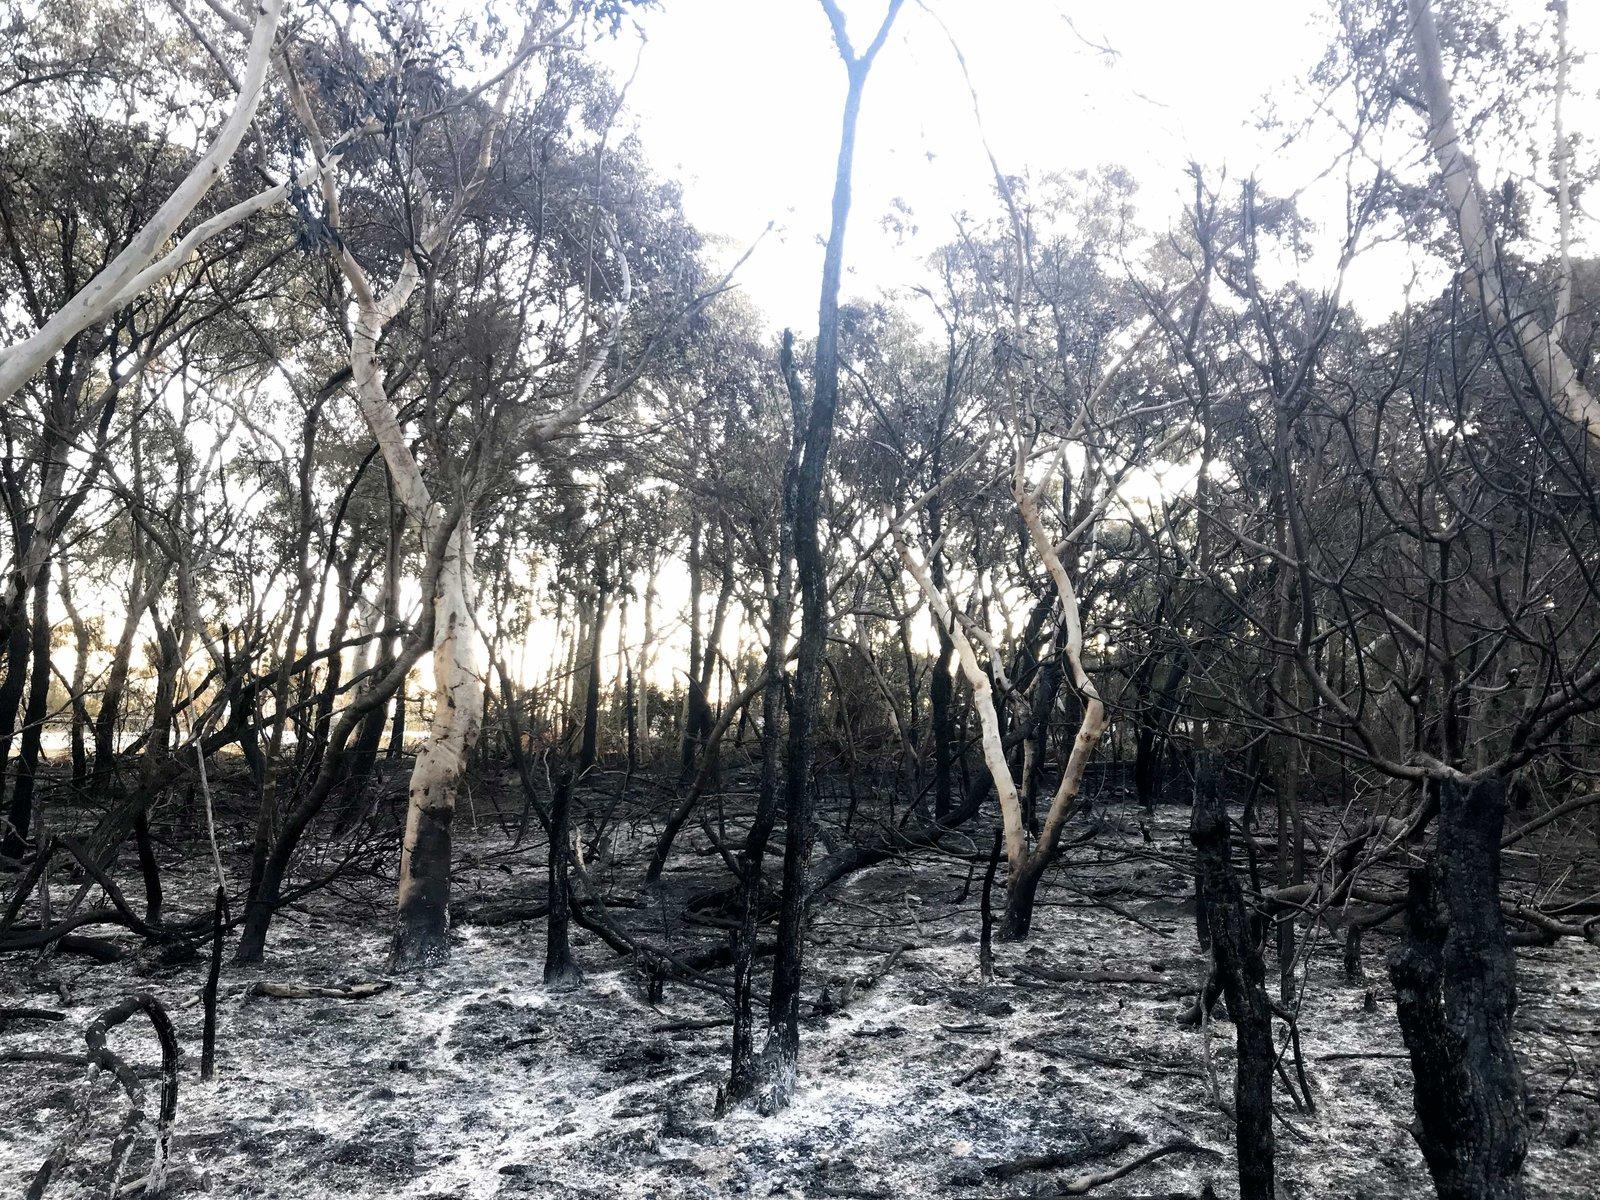 Burnt habitat